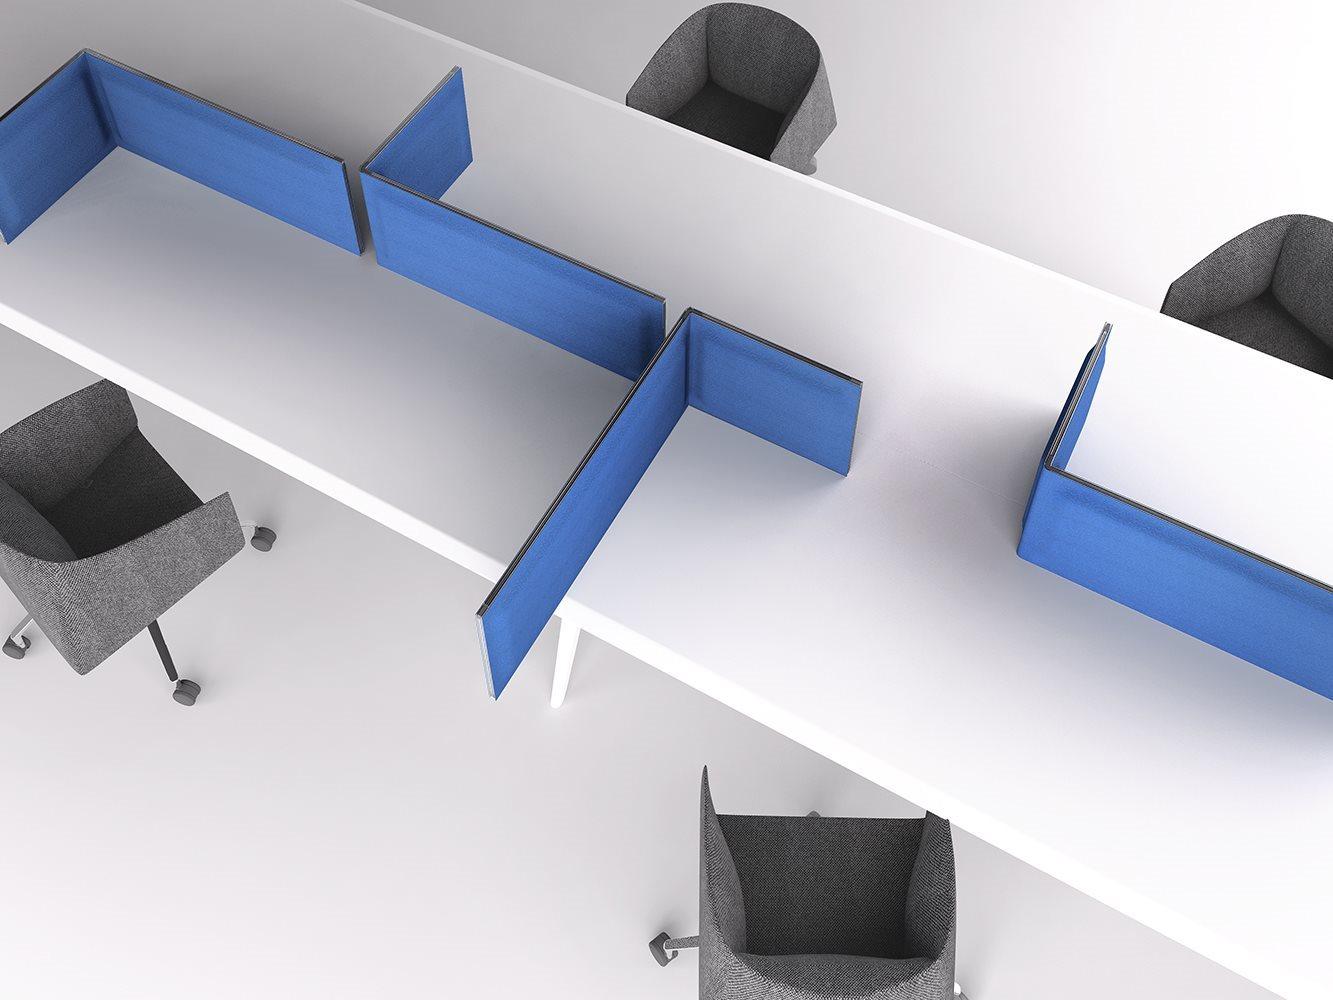 Tecno spa mobiliario de oficina de diseno adeyaka bcn for Mobiliario diseno oficina